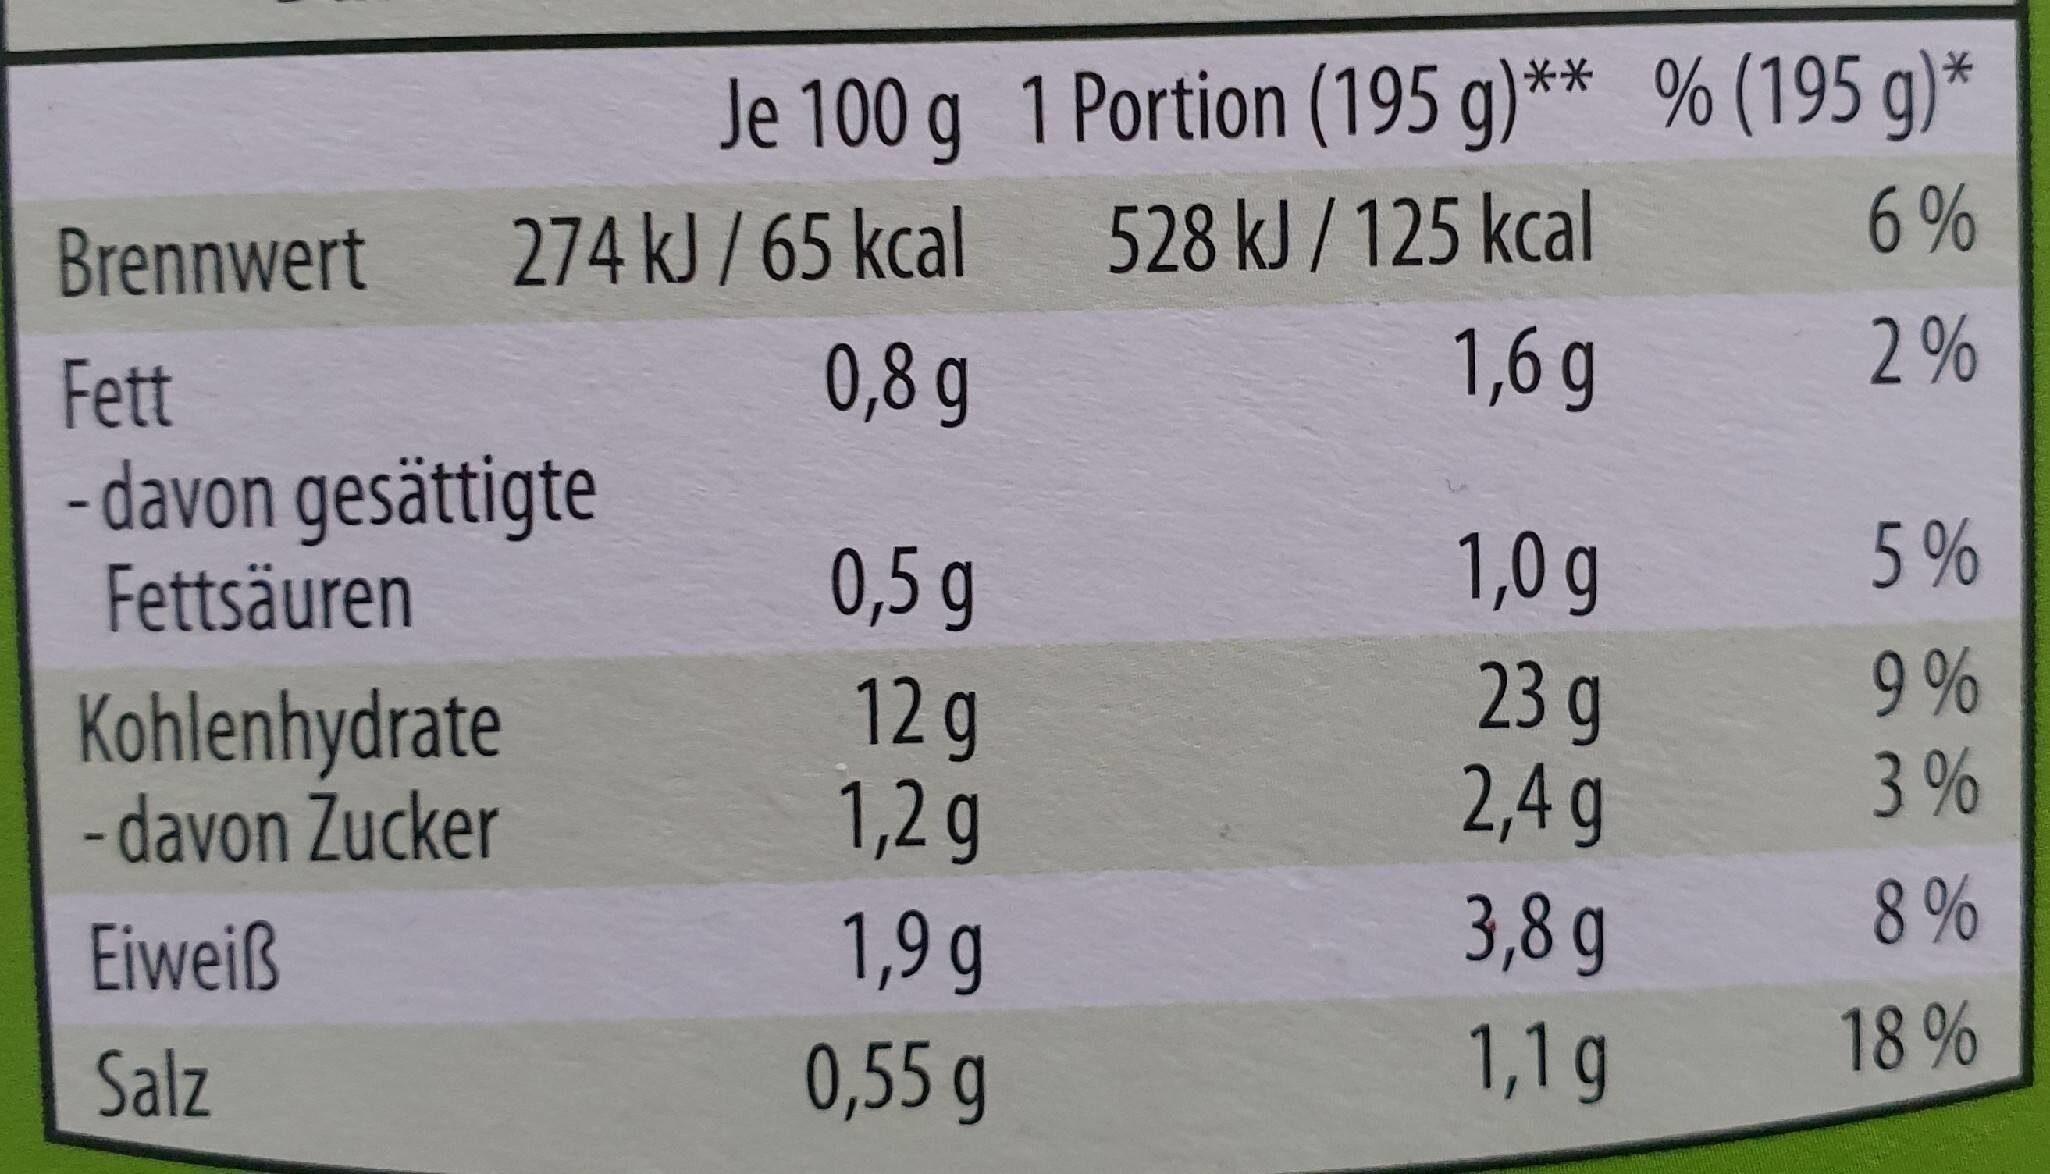 Kartoffelpüree 6 x 3 trockenprodukt, kartoffel - Informations nutritionnelles - de